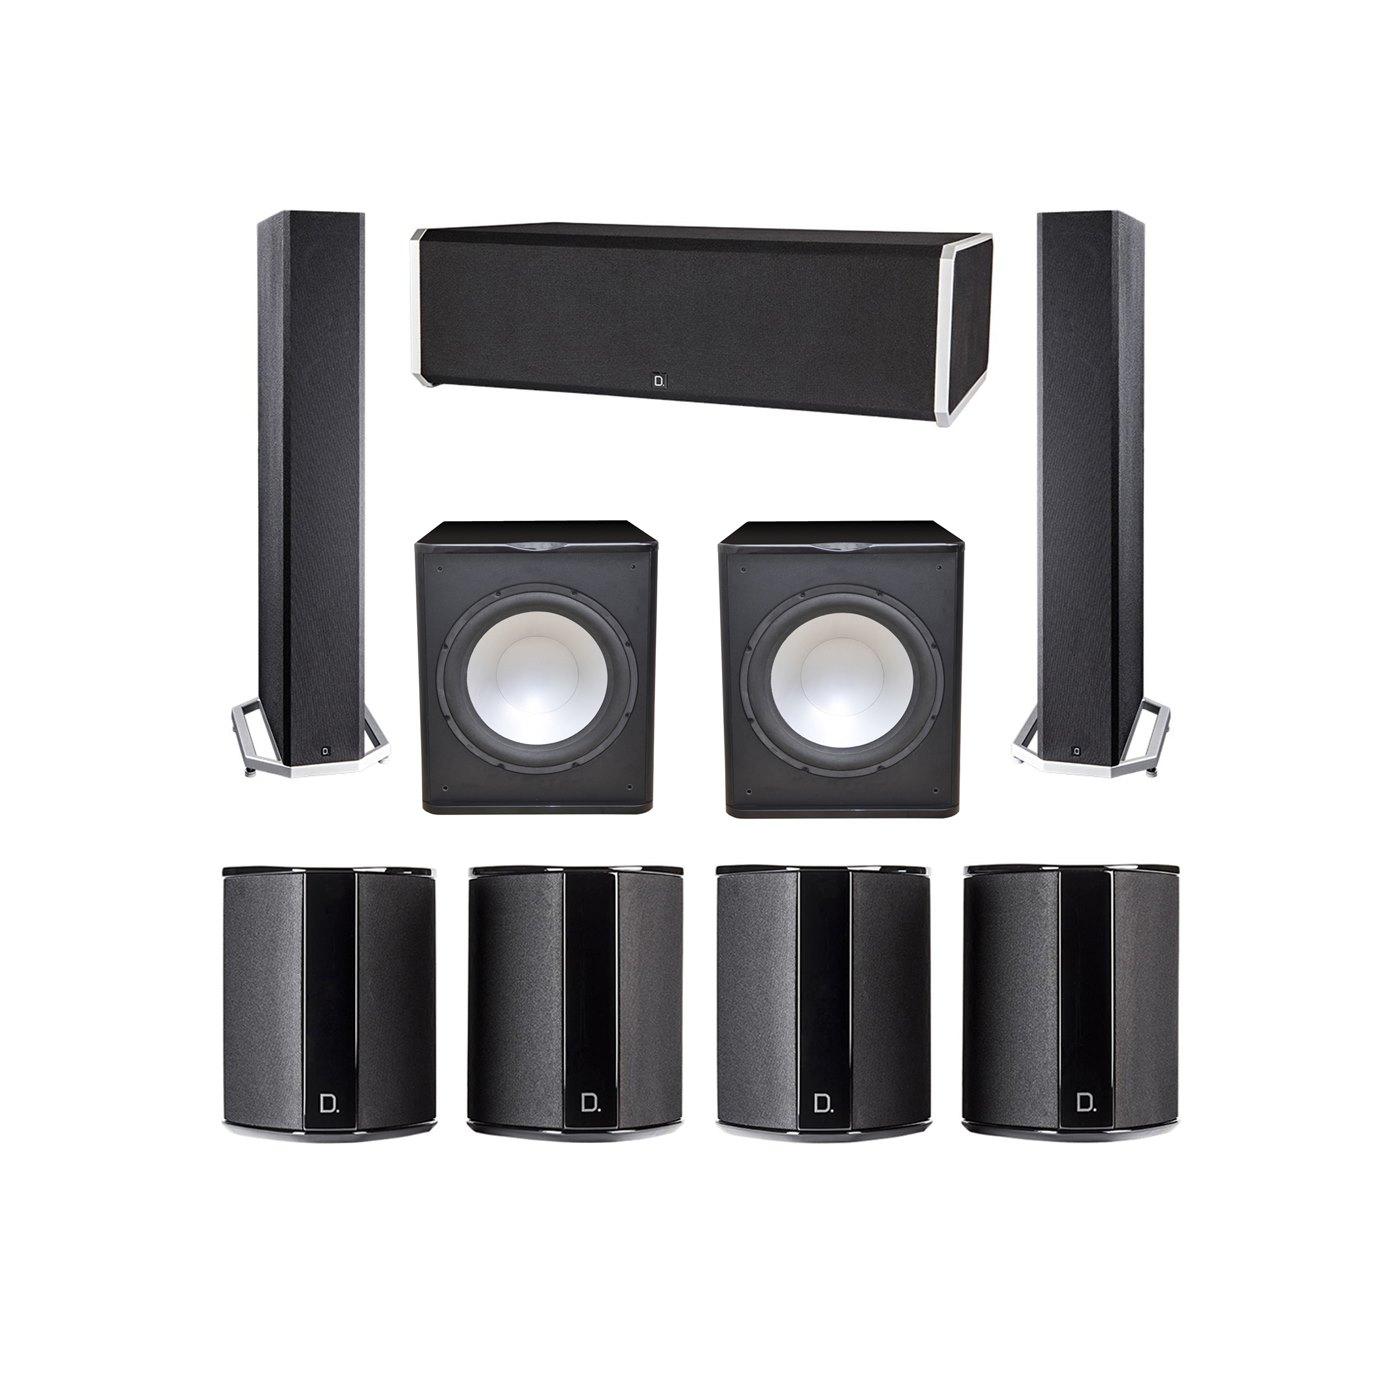 Definitive Technology 7.2 System with 2 BP9040 Tower Speakers, 1 CS9080 Center Channel Speaker, 4 SR9040 Surround Speaker, 2 Premier Acoustic PA-150 Subwoofer